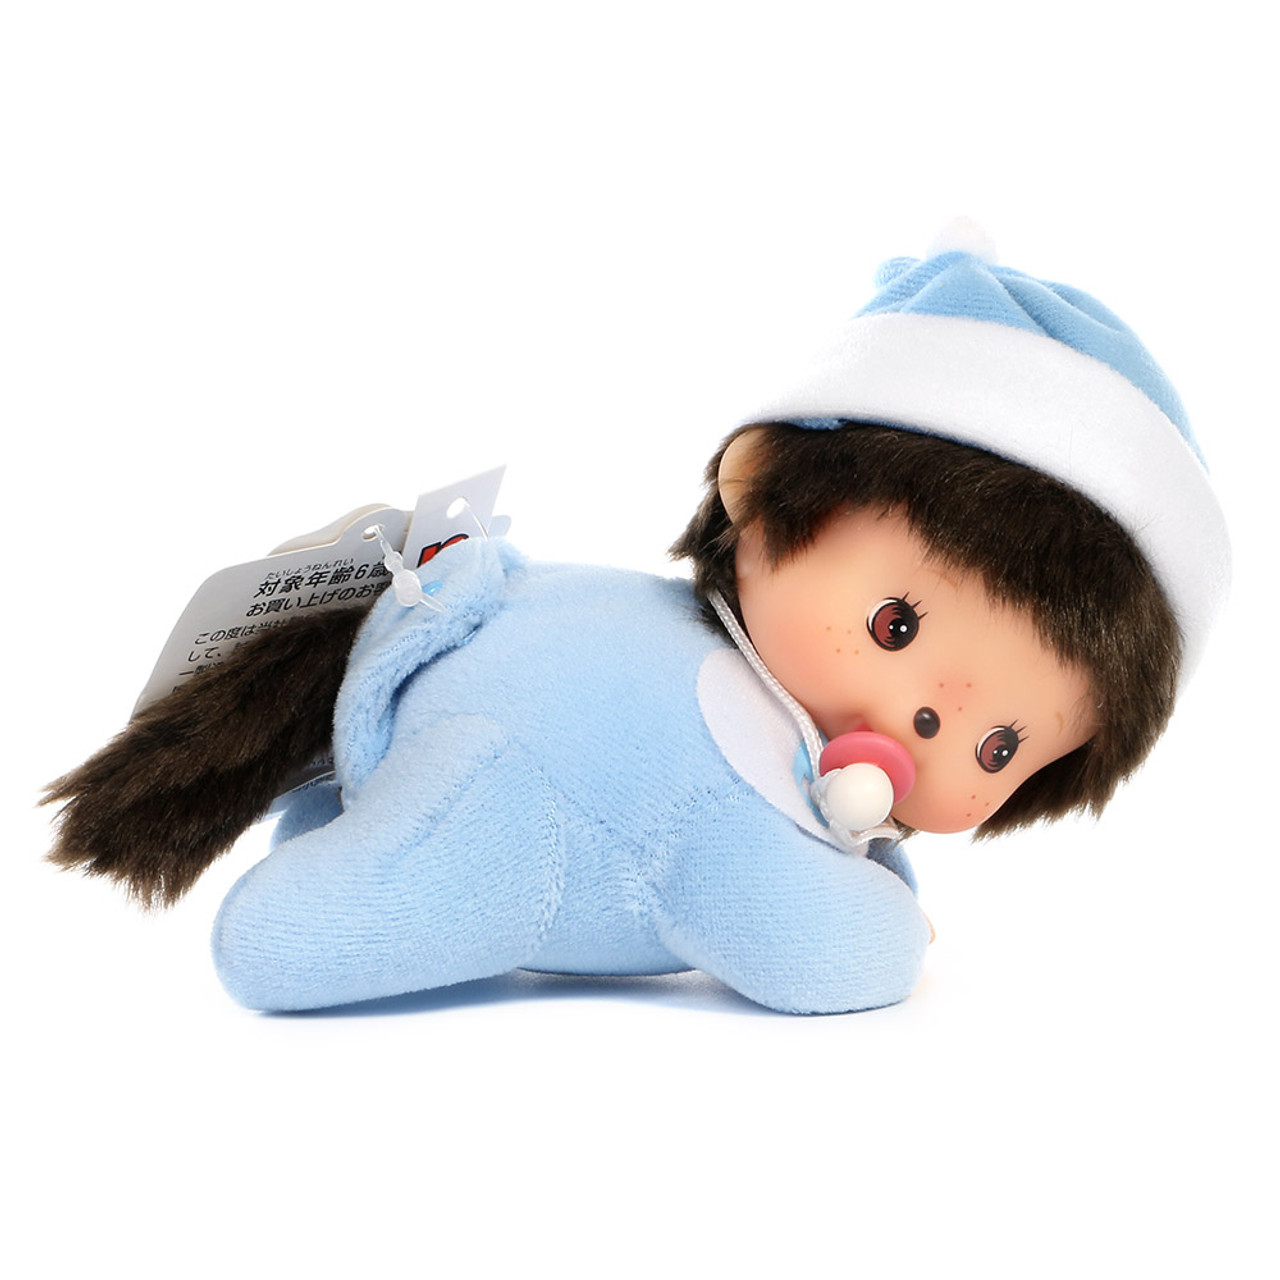 Sekiguchi Bebichhichi Monkey Boy Baby Shirt Crawling Plush Doll - Small ( Front View )